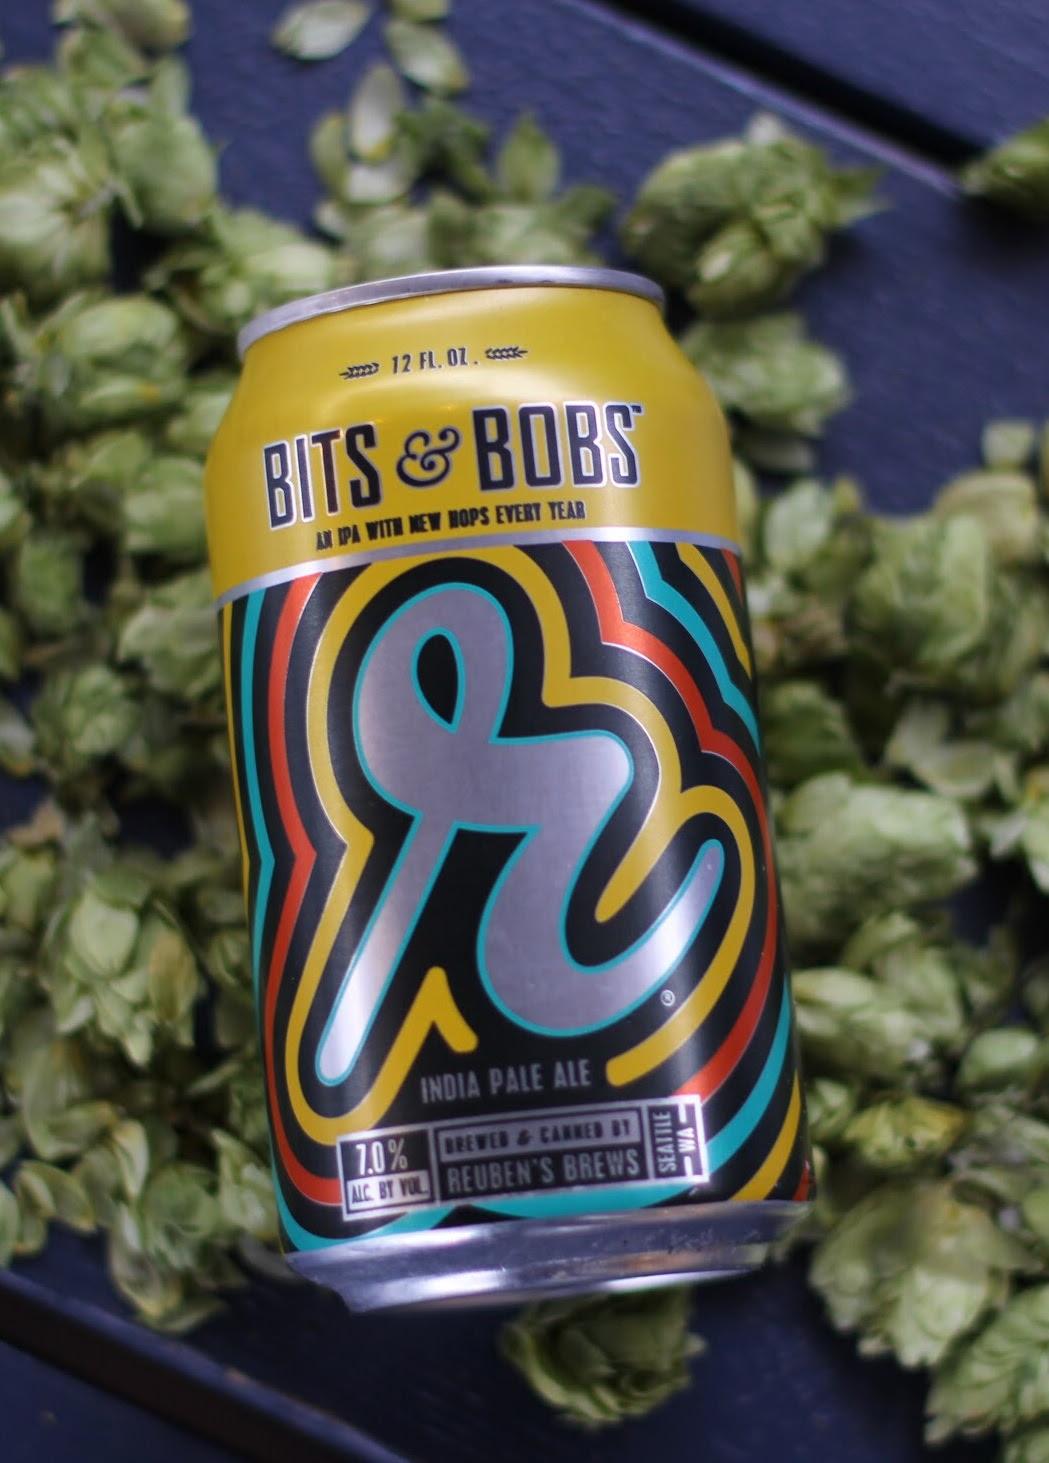 image of Bits & Bobs IPA courtesy of Reuben's Brews